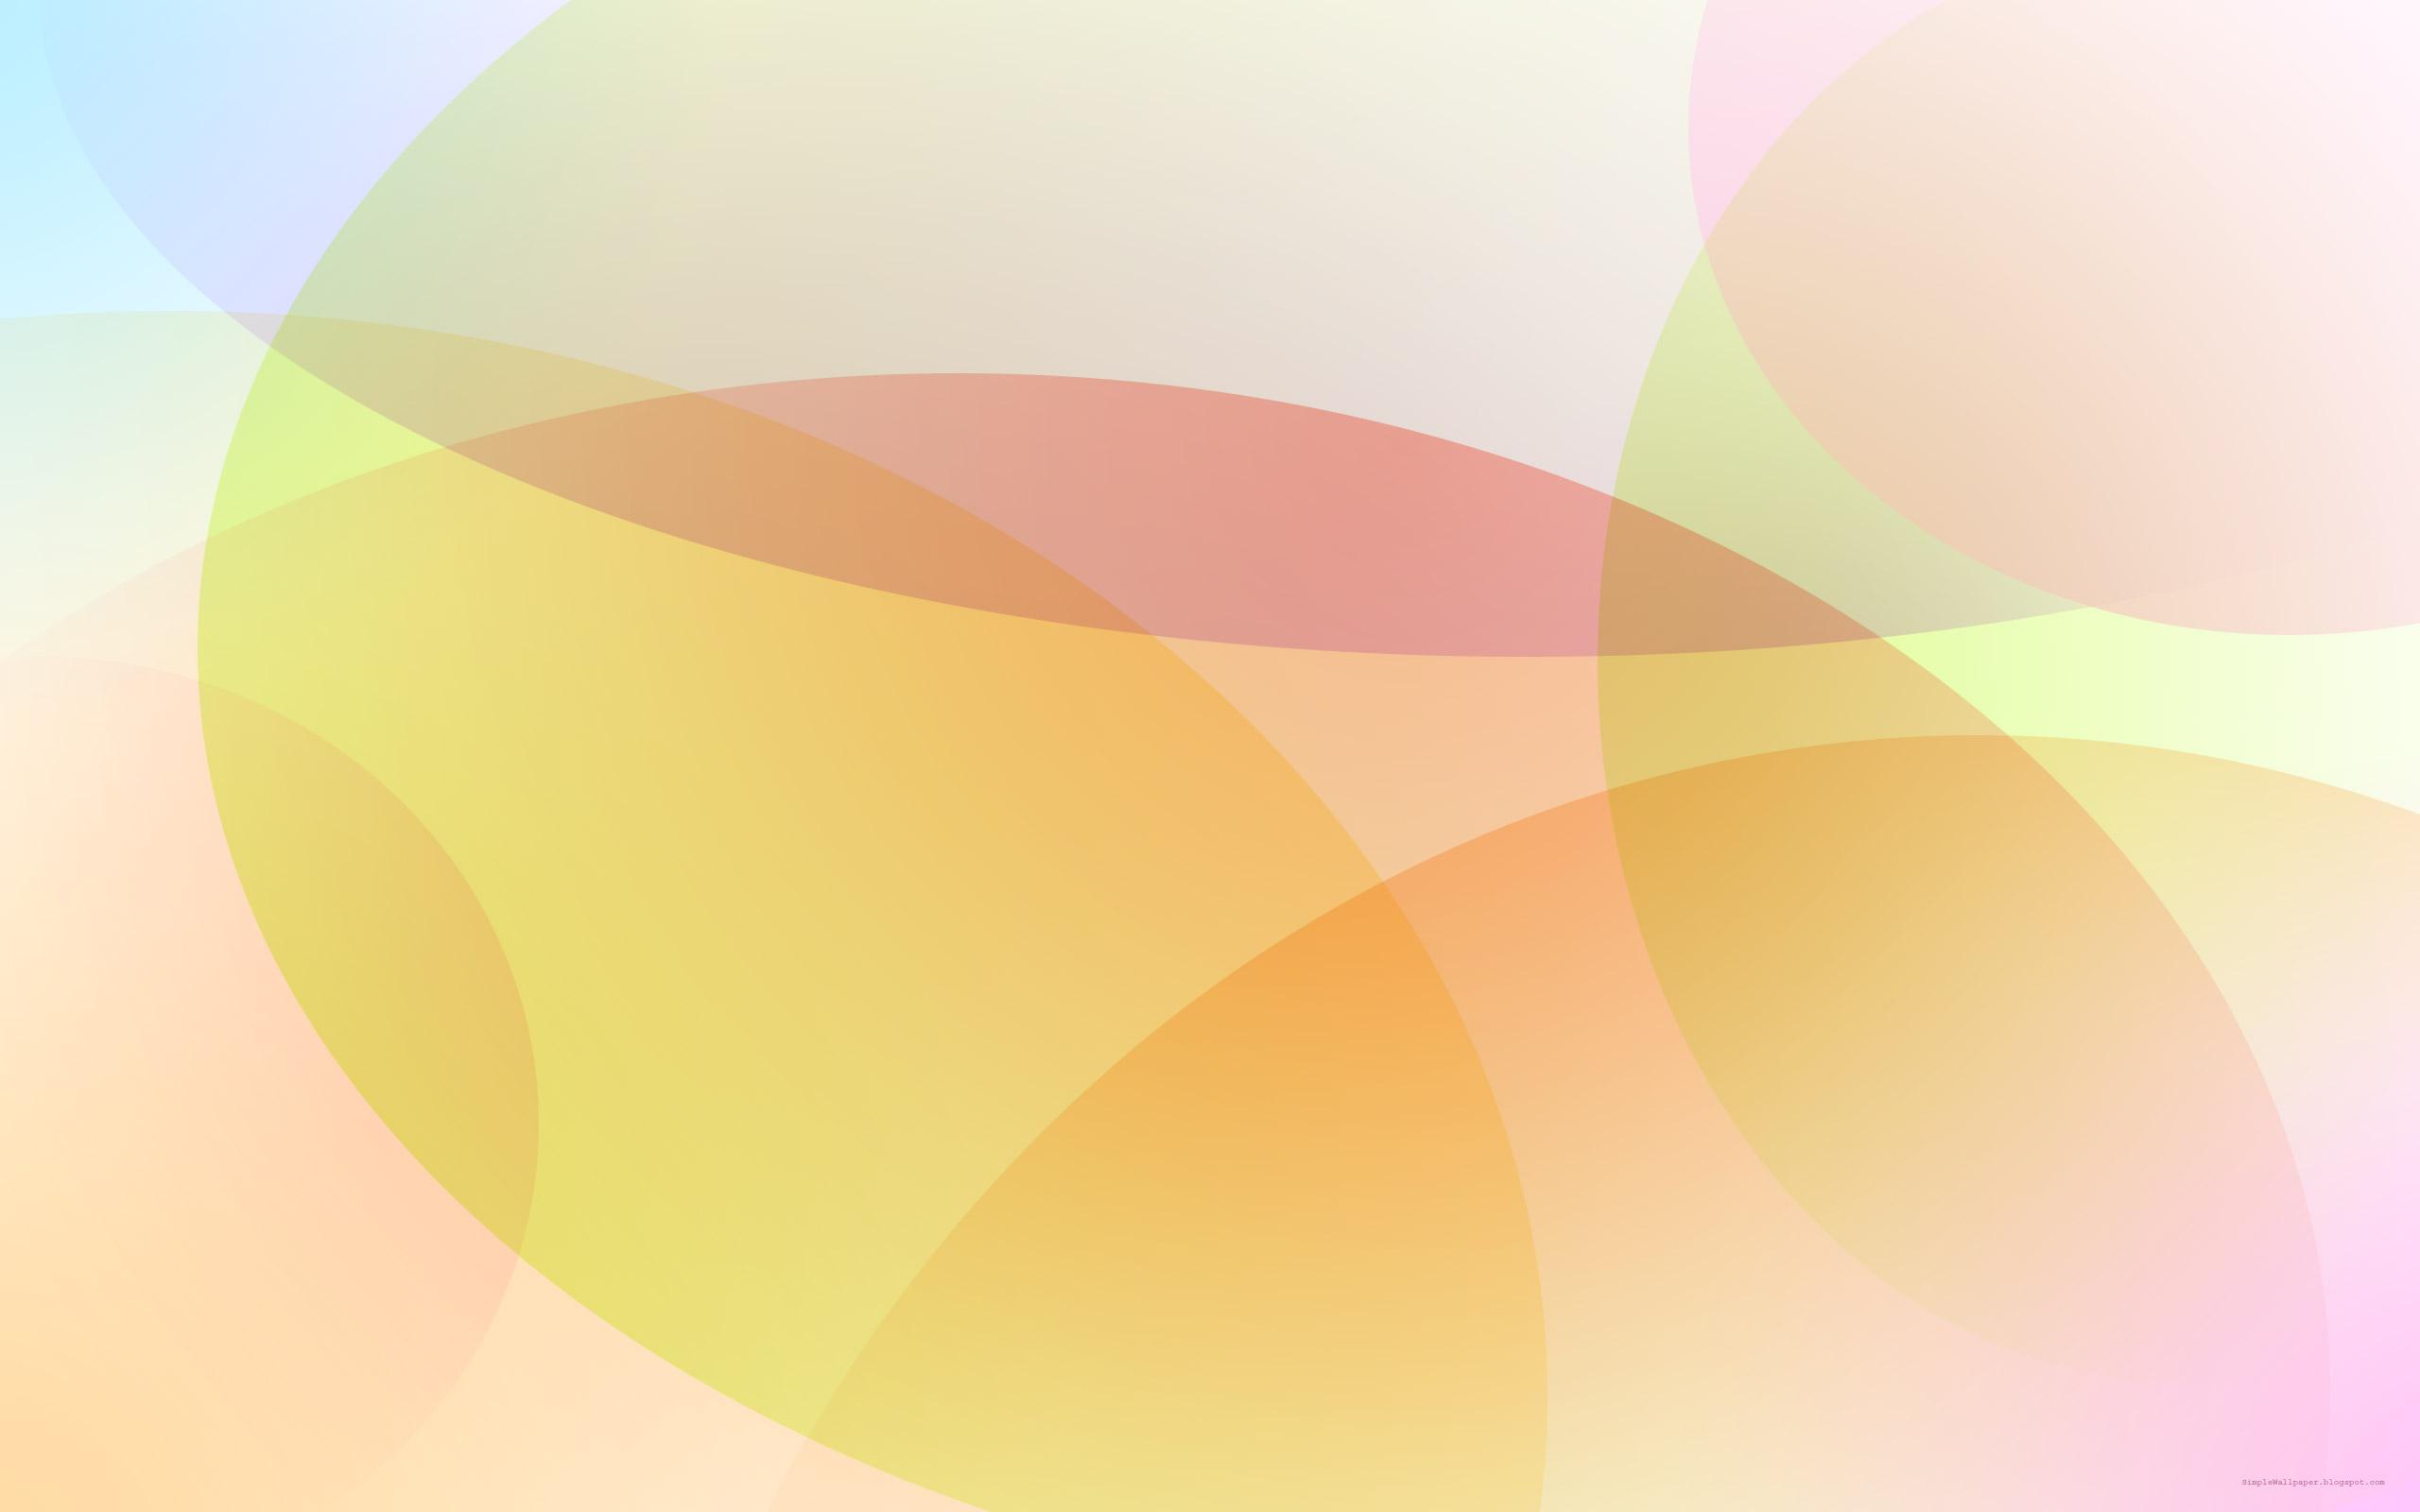 Pastel Rainbow Wallpaper wallpaper Pastel Rainbow Wallpaper hd 2560x1600